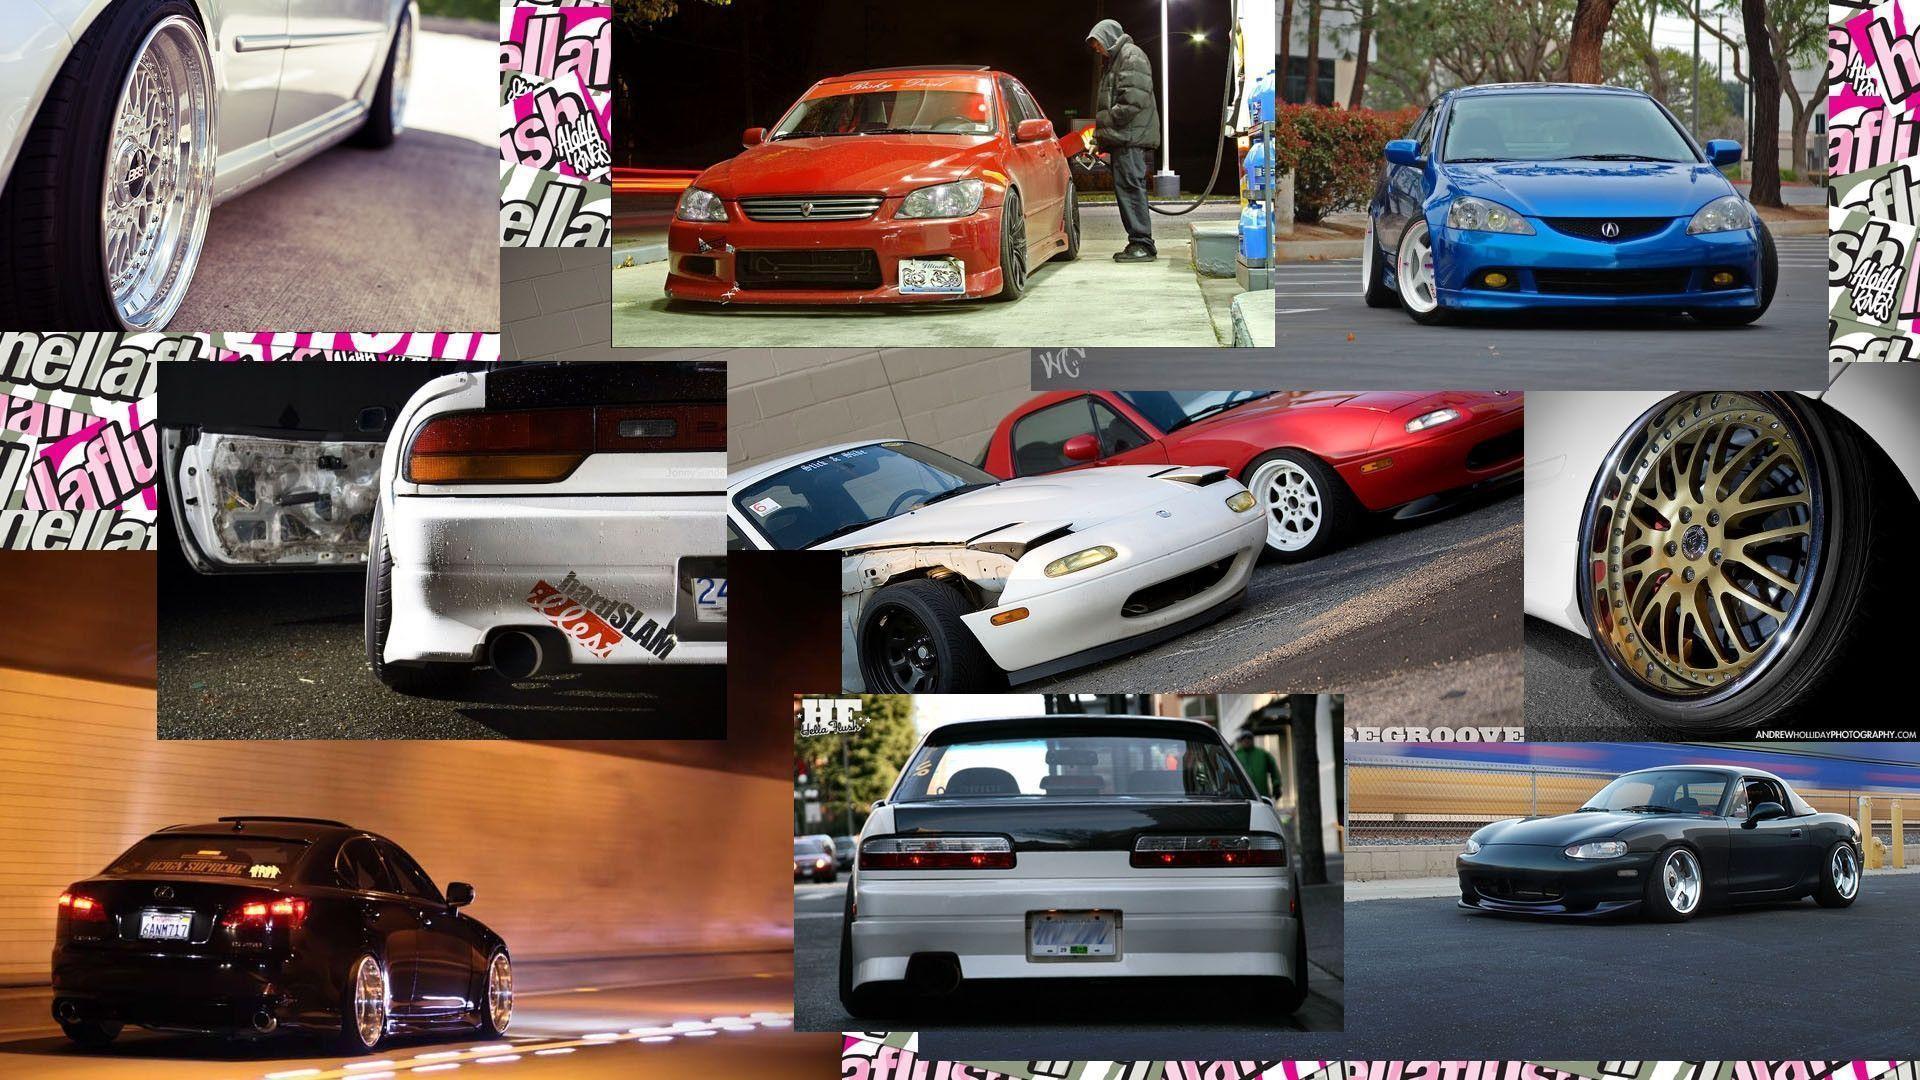 hellaflush wallpaper car - photo #2